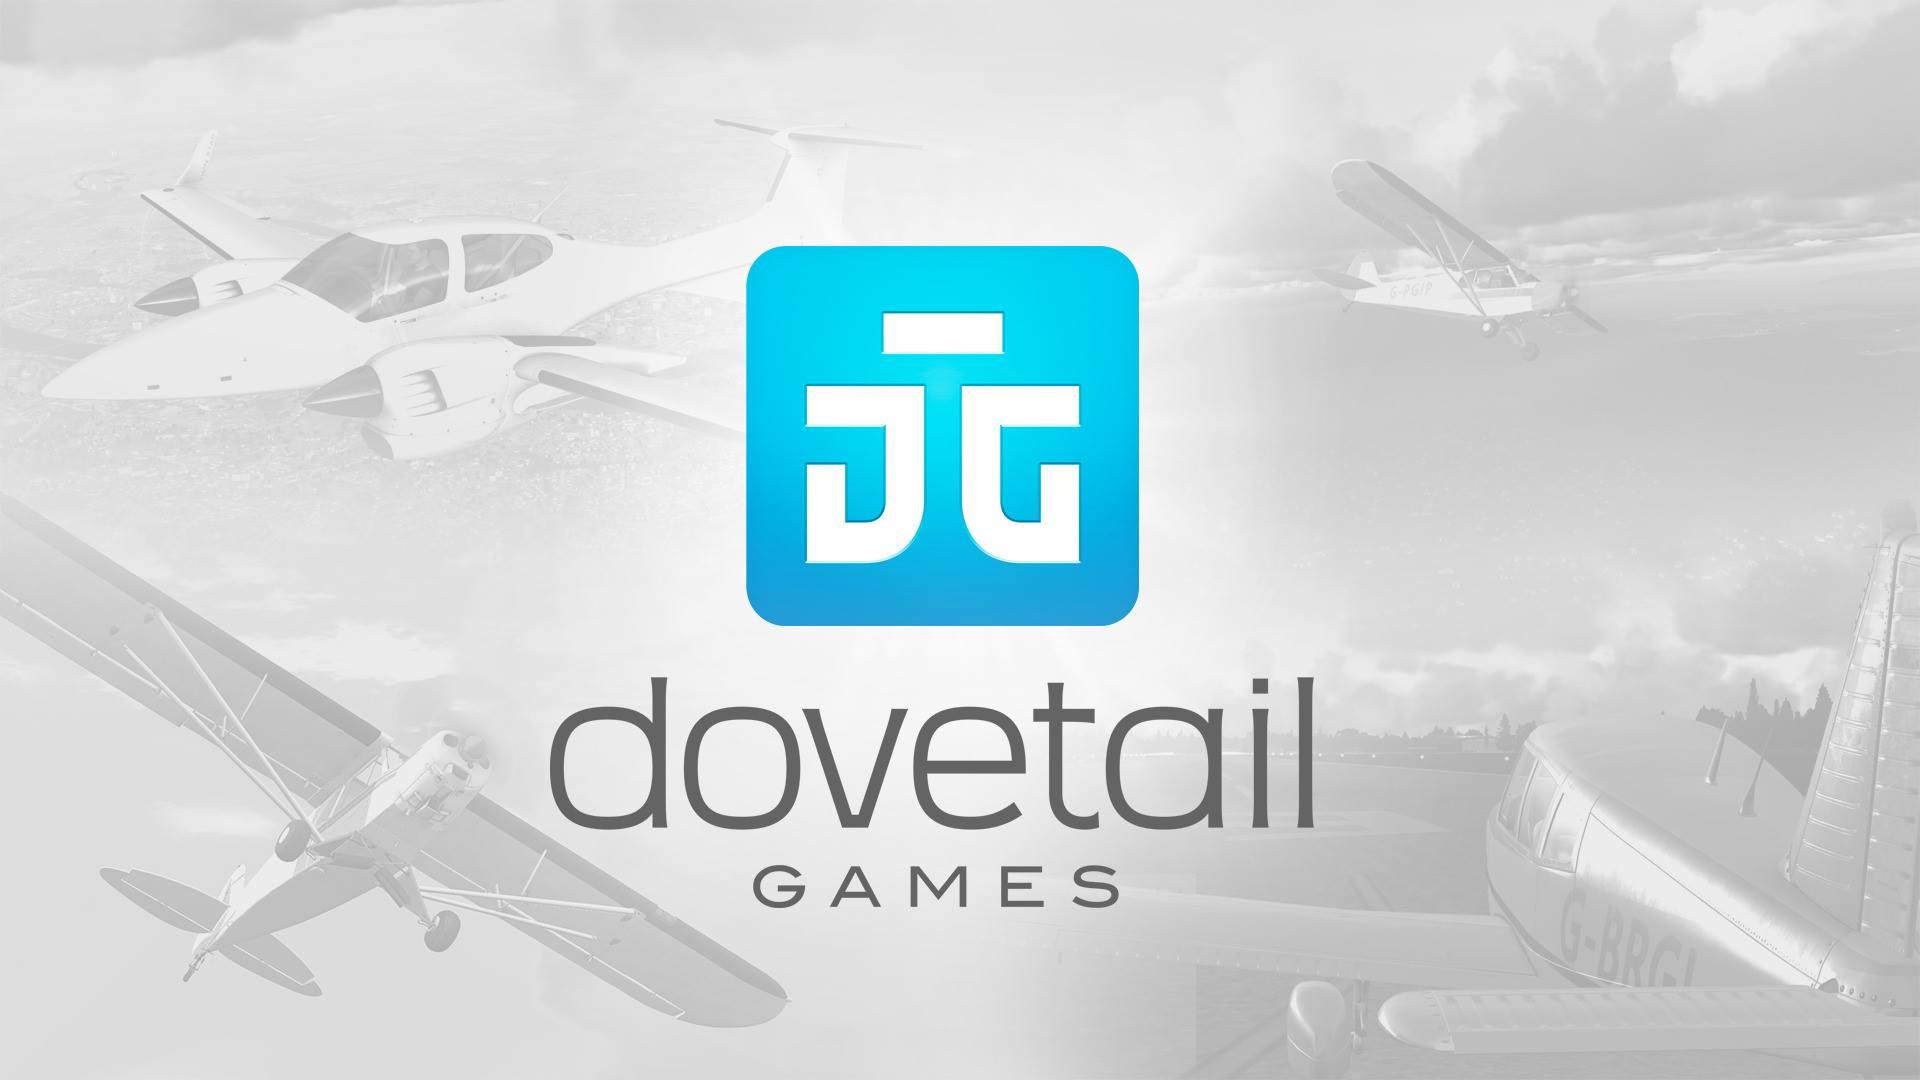 dovetail-games-flight